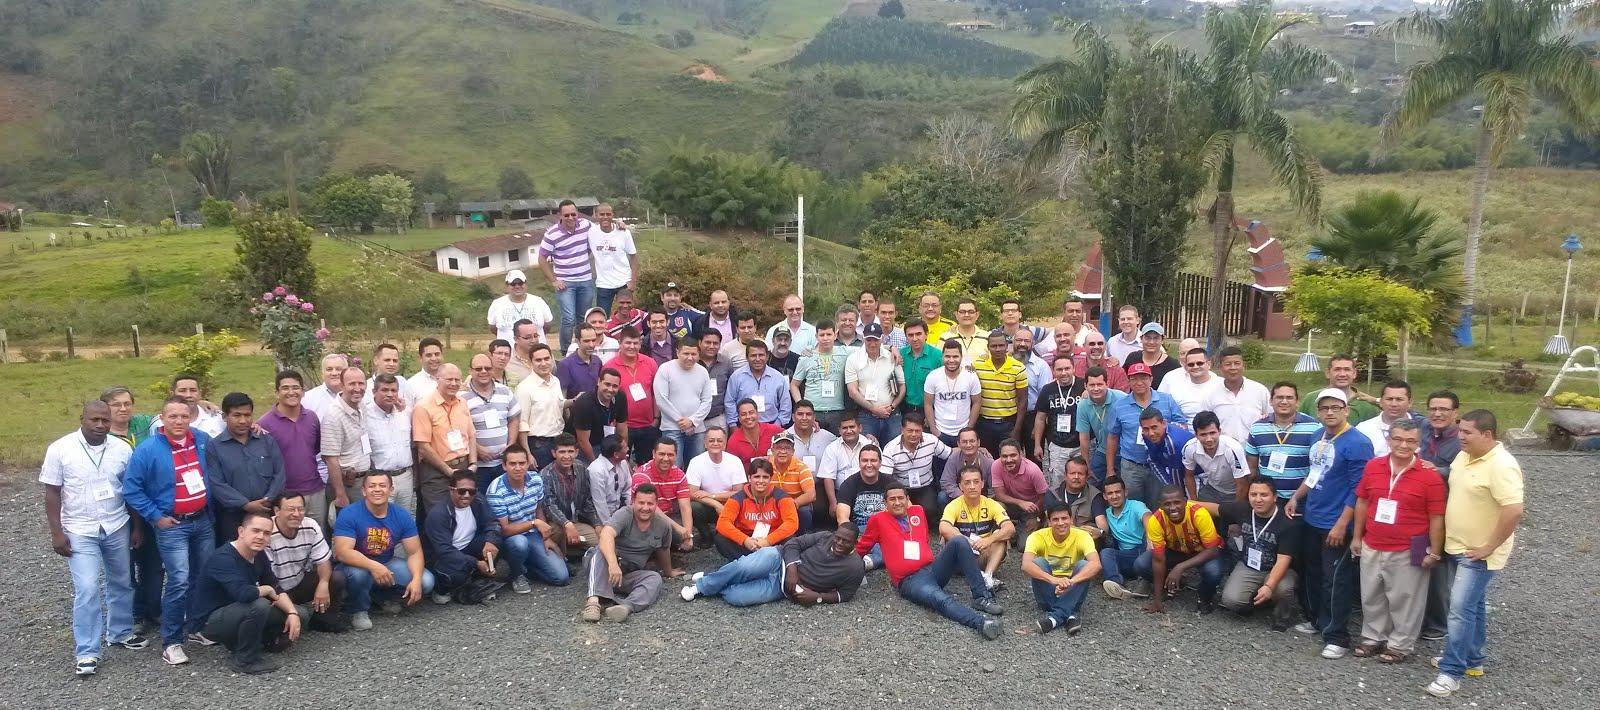 Mp3´s IV Convención  2014